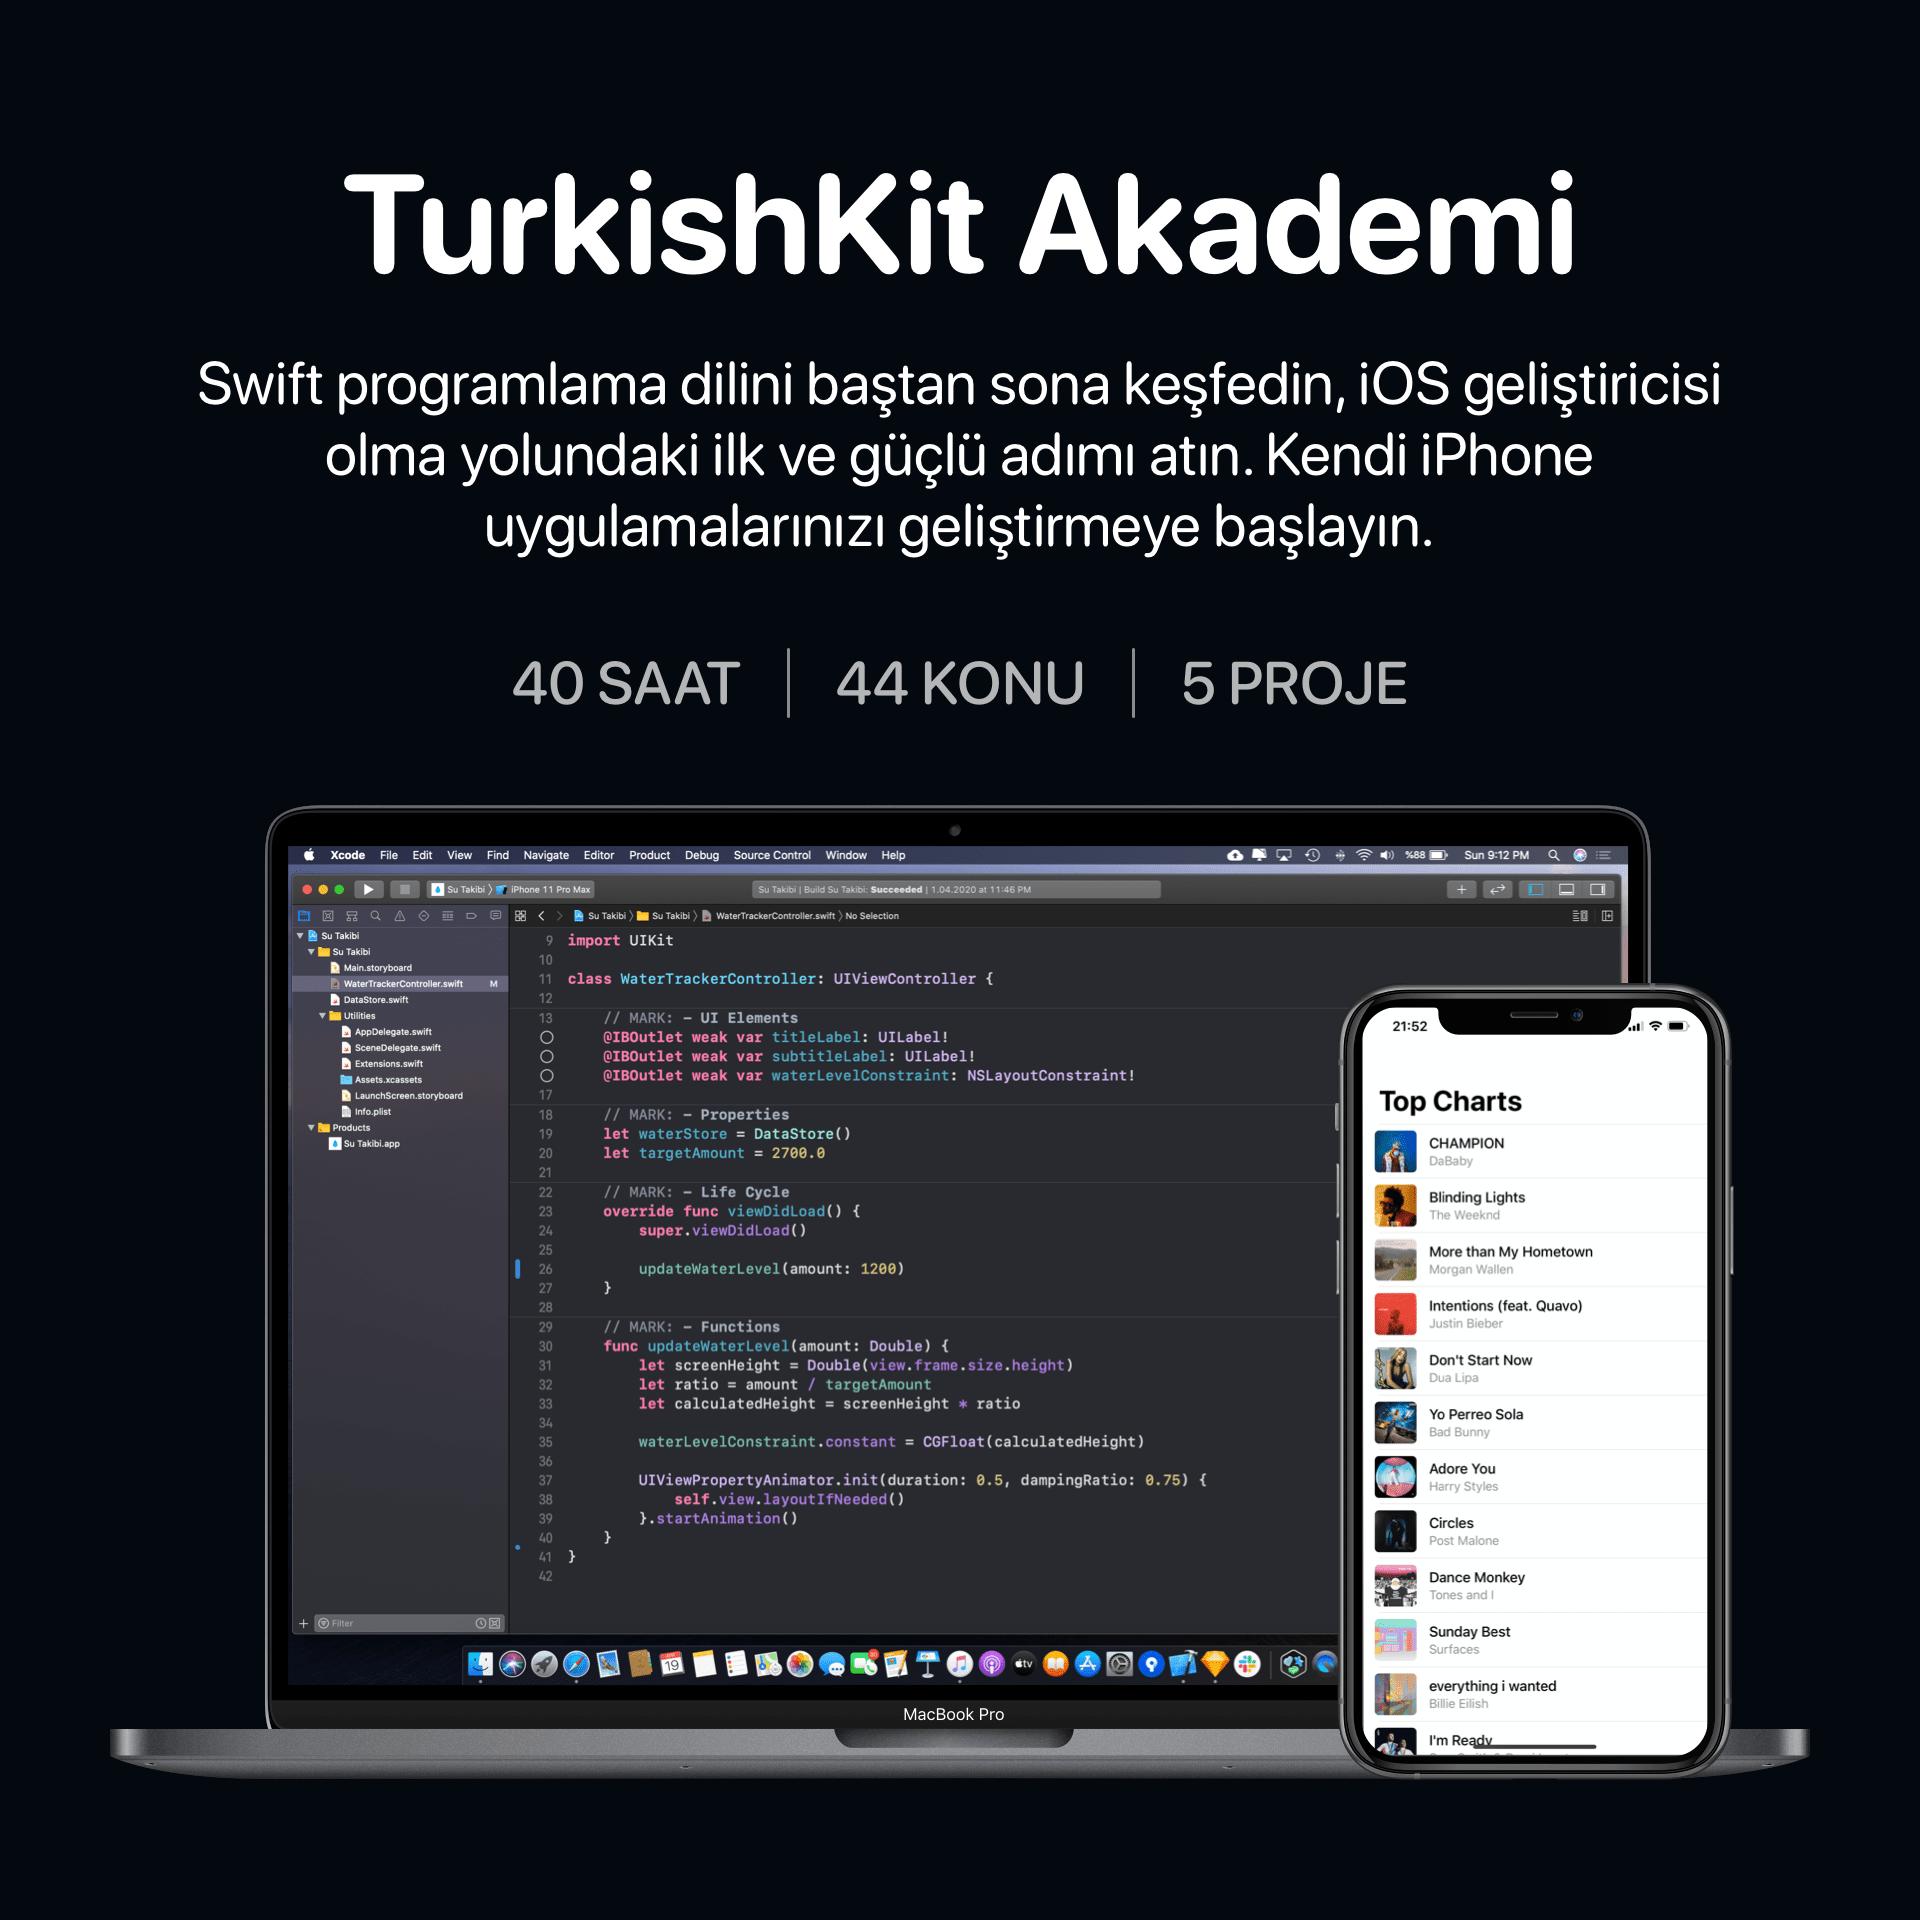 TurkishKit Akademi